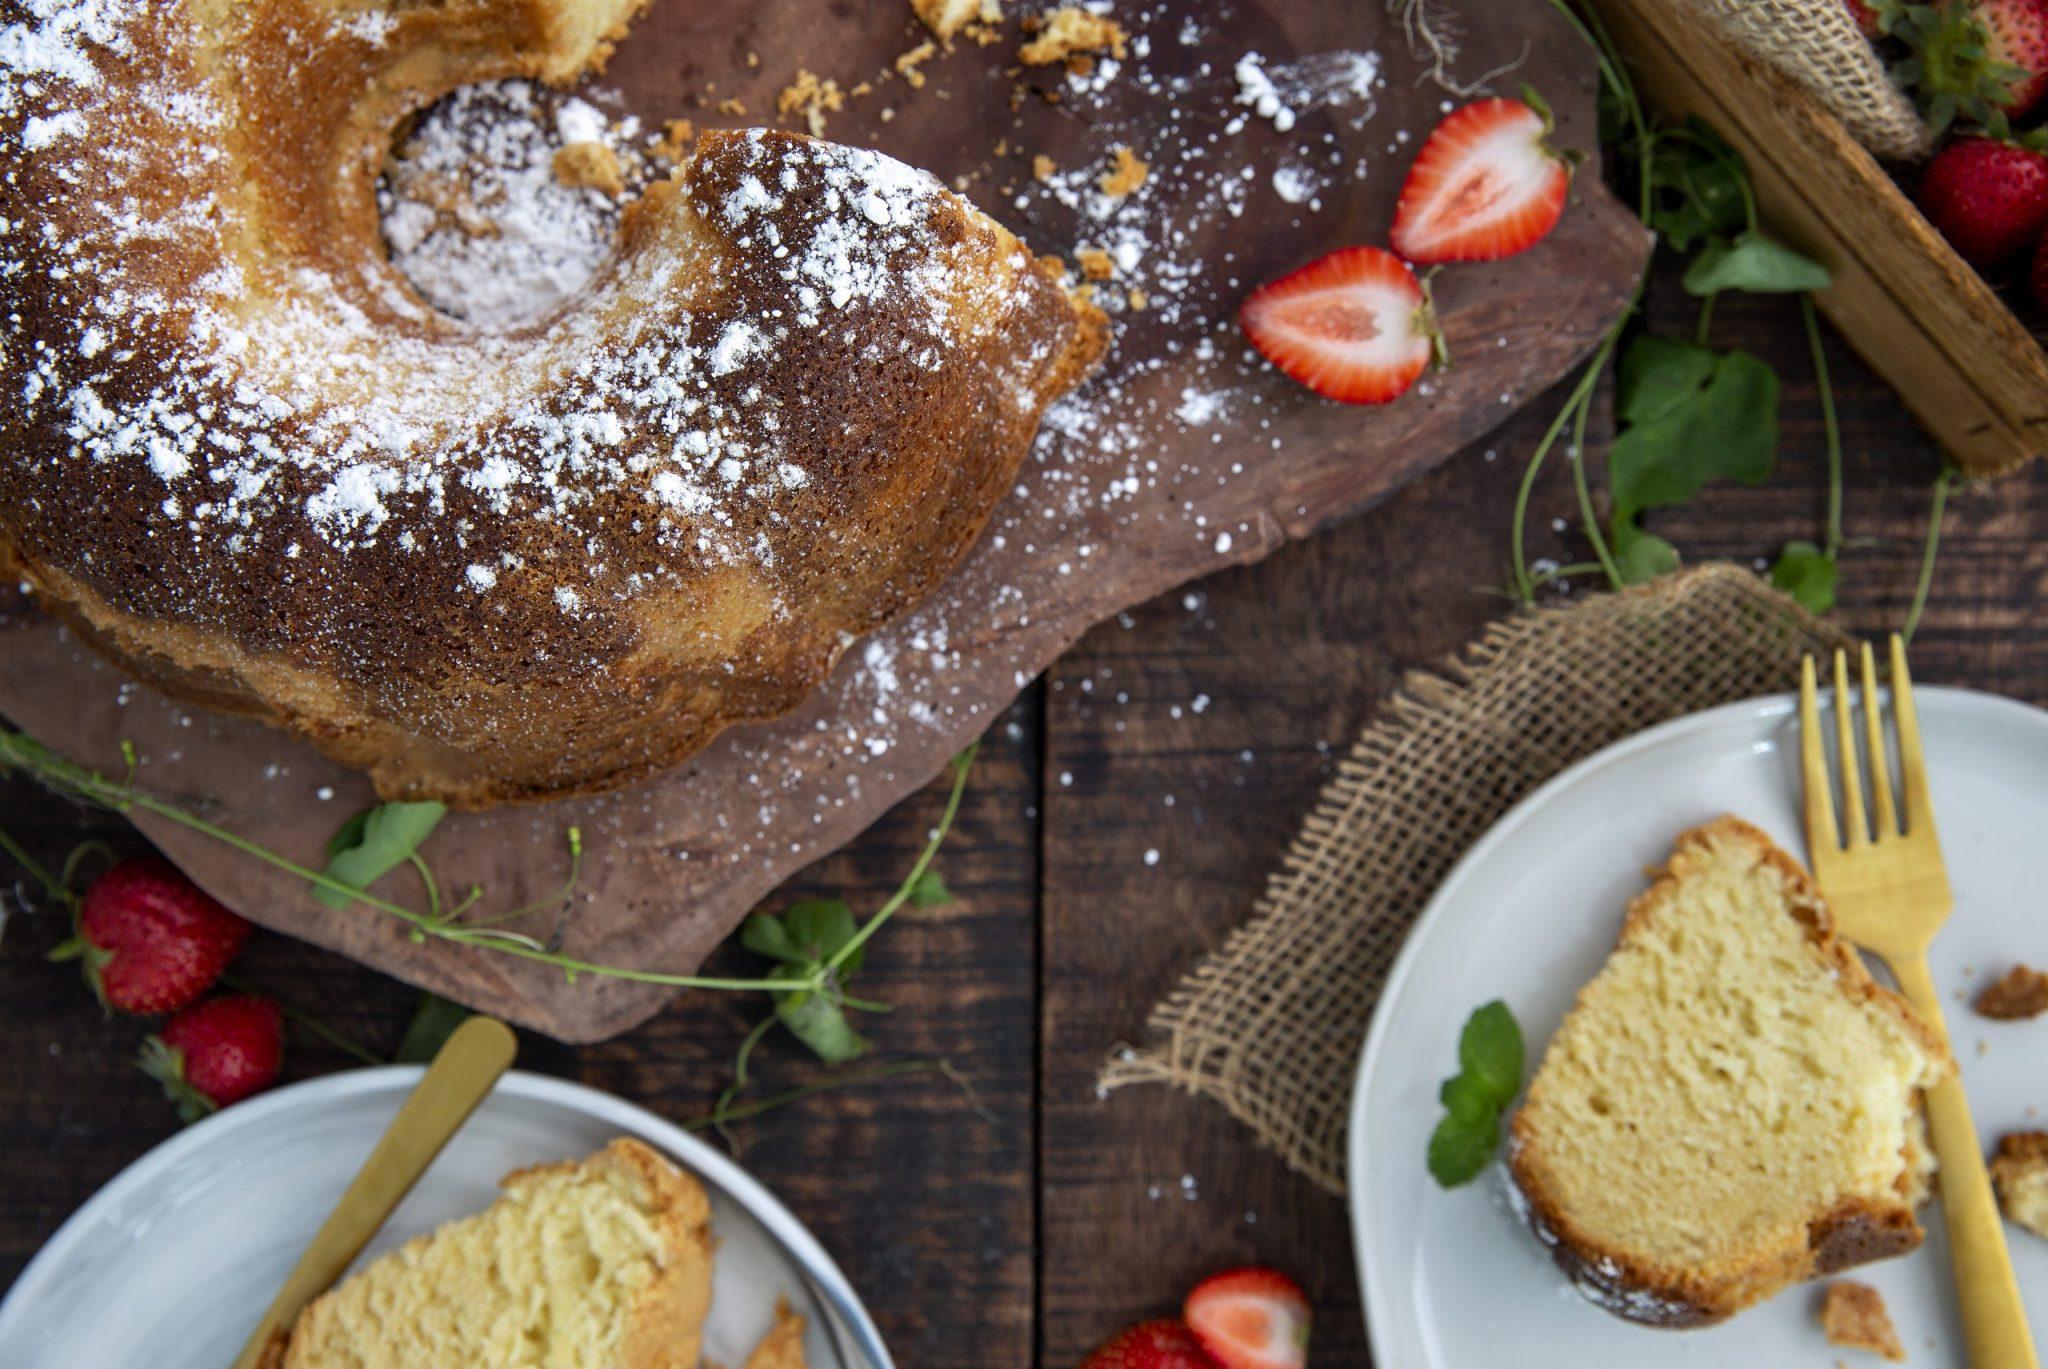 Gluten-Free Sour Cream Pound Cake